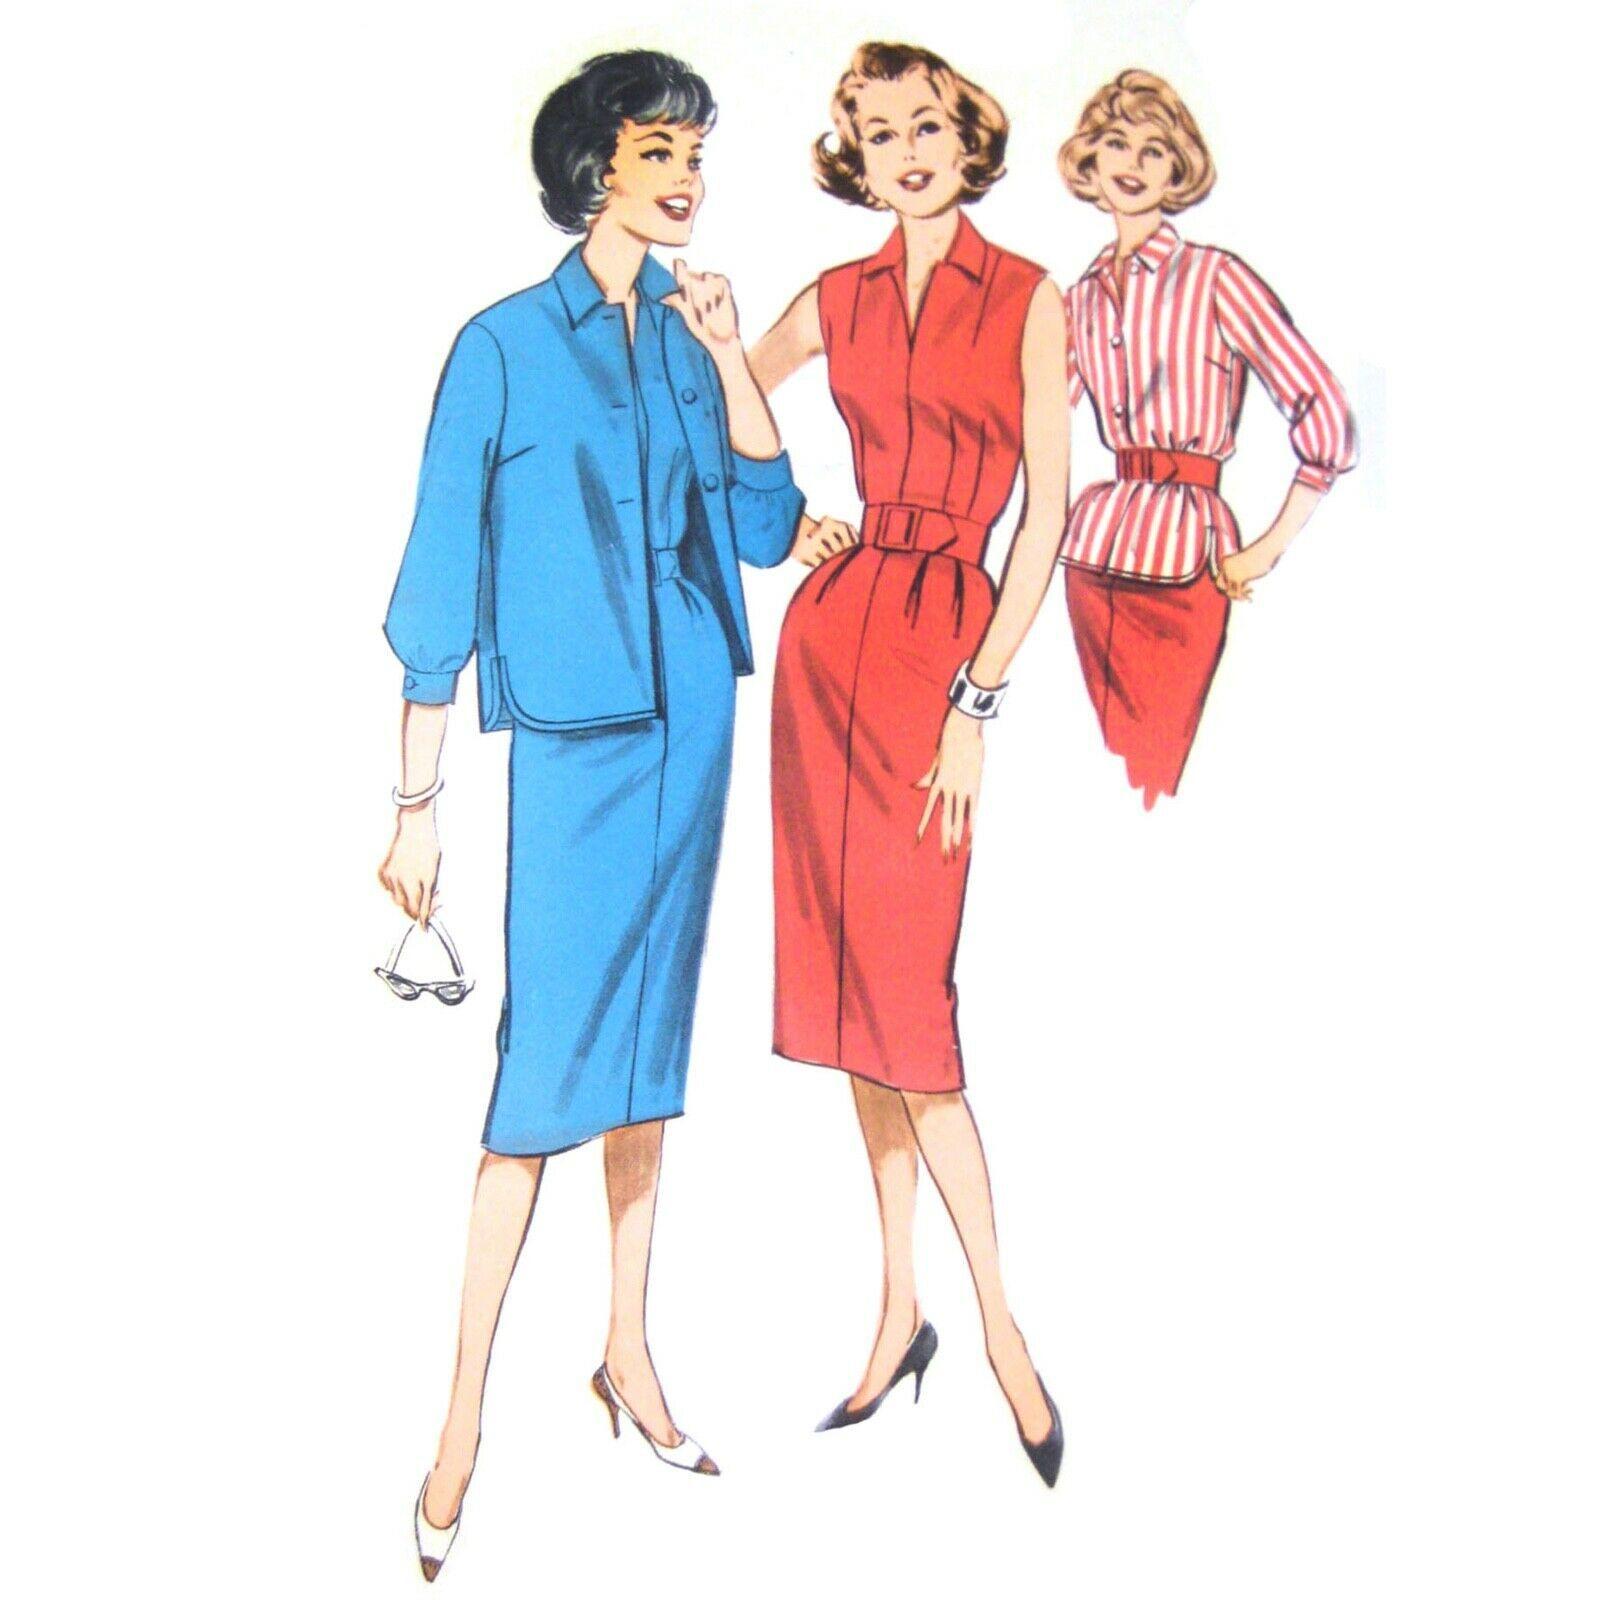 1960s Vtg Butterick Sewing Pattern 9308 Misses Sleeveless Sheath Dress Jacket 14 - $6.95